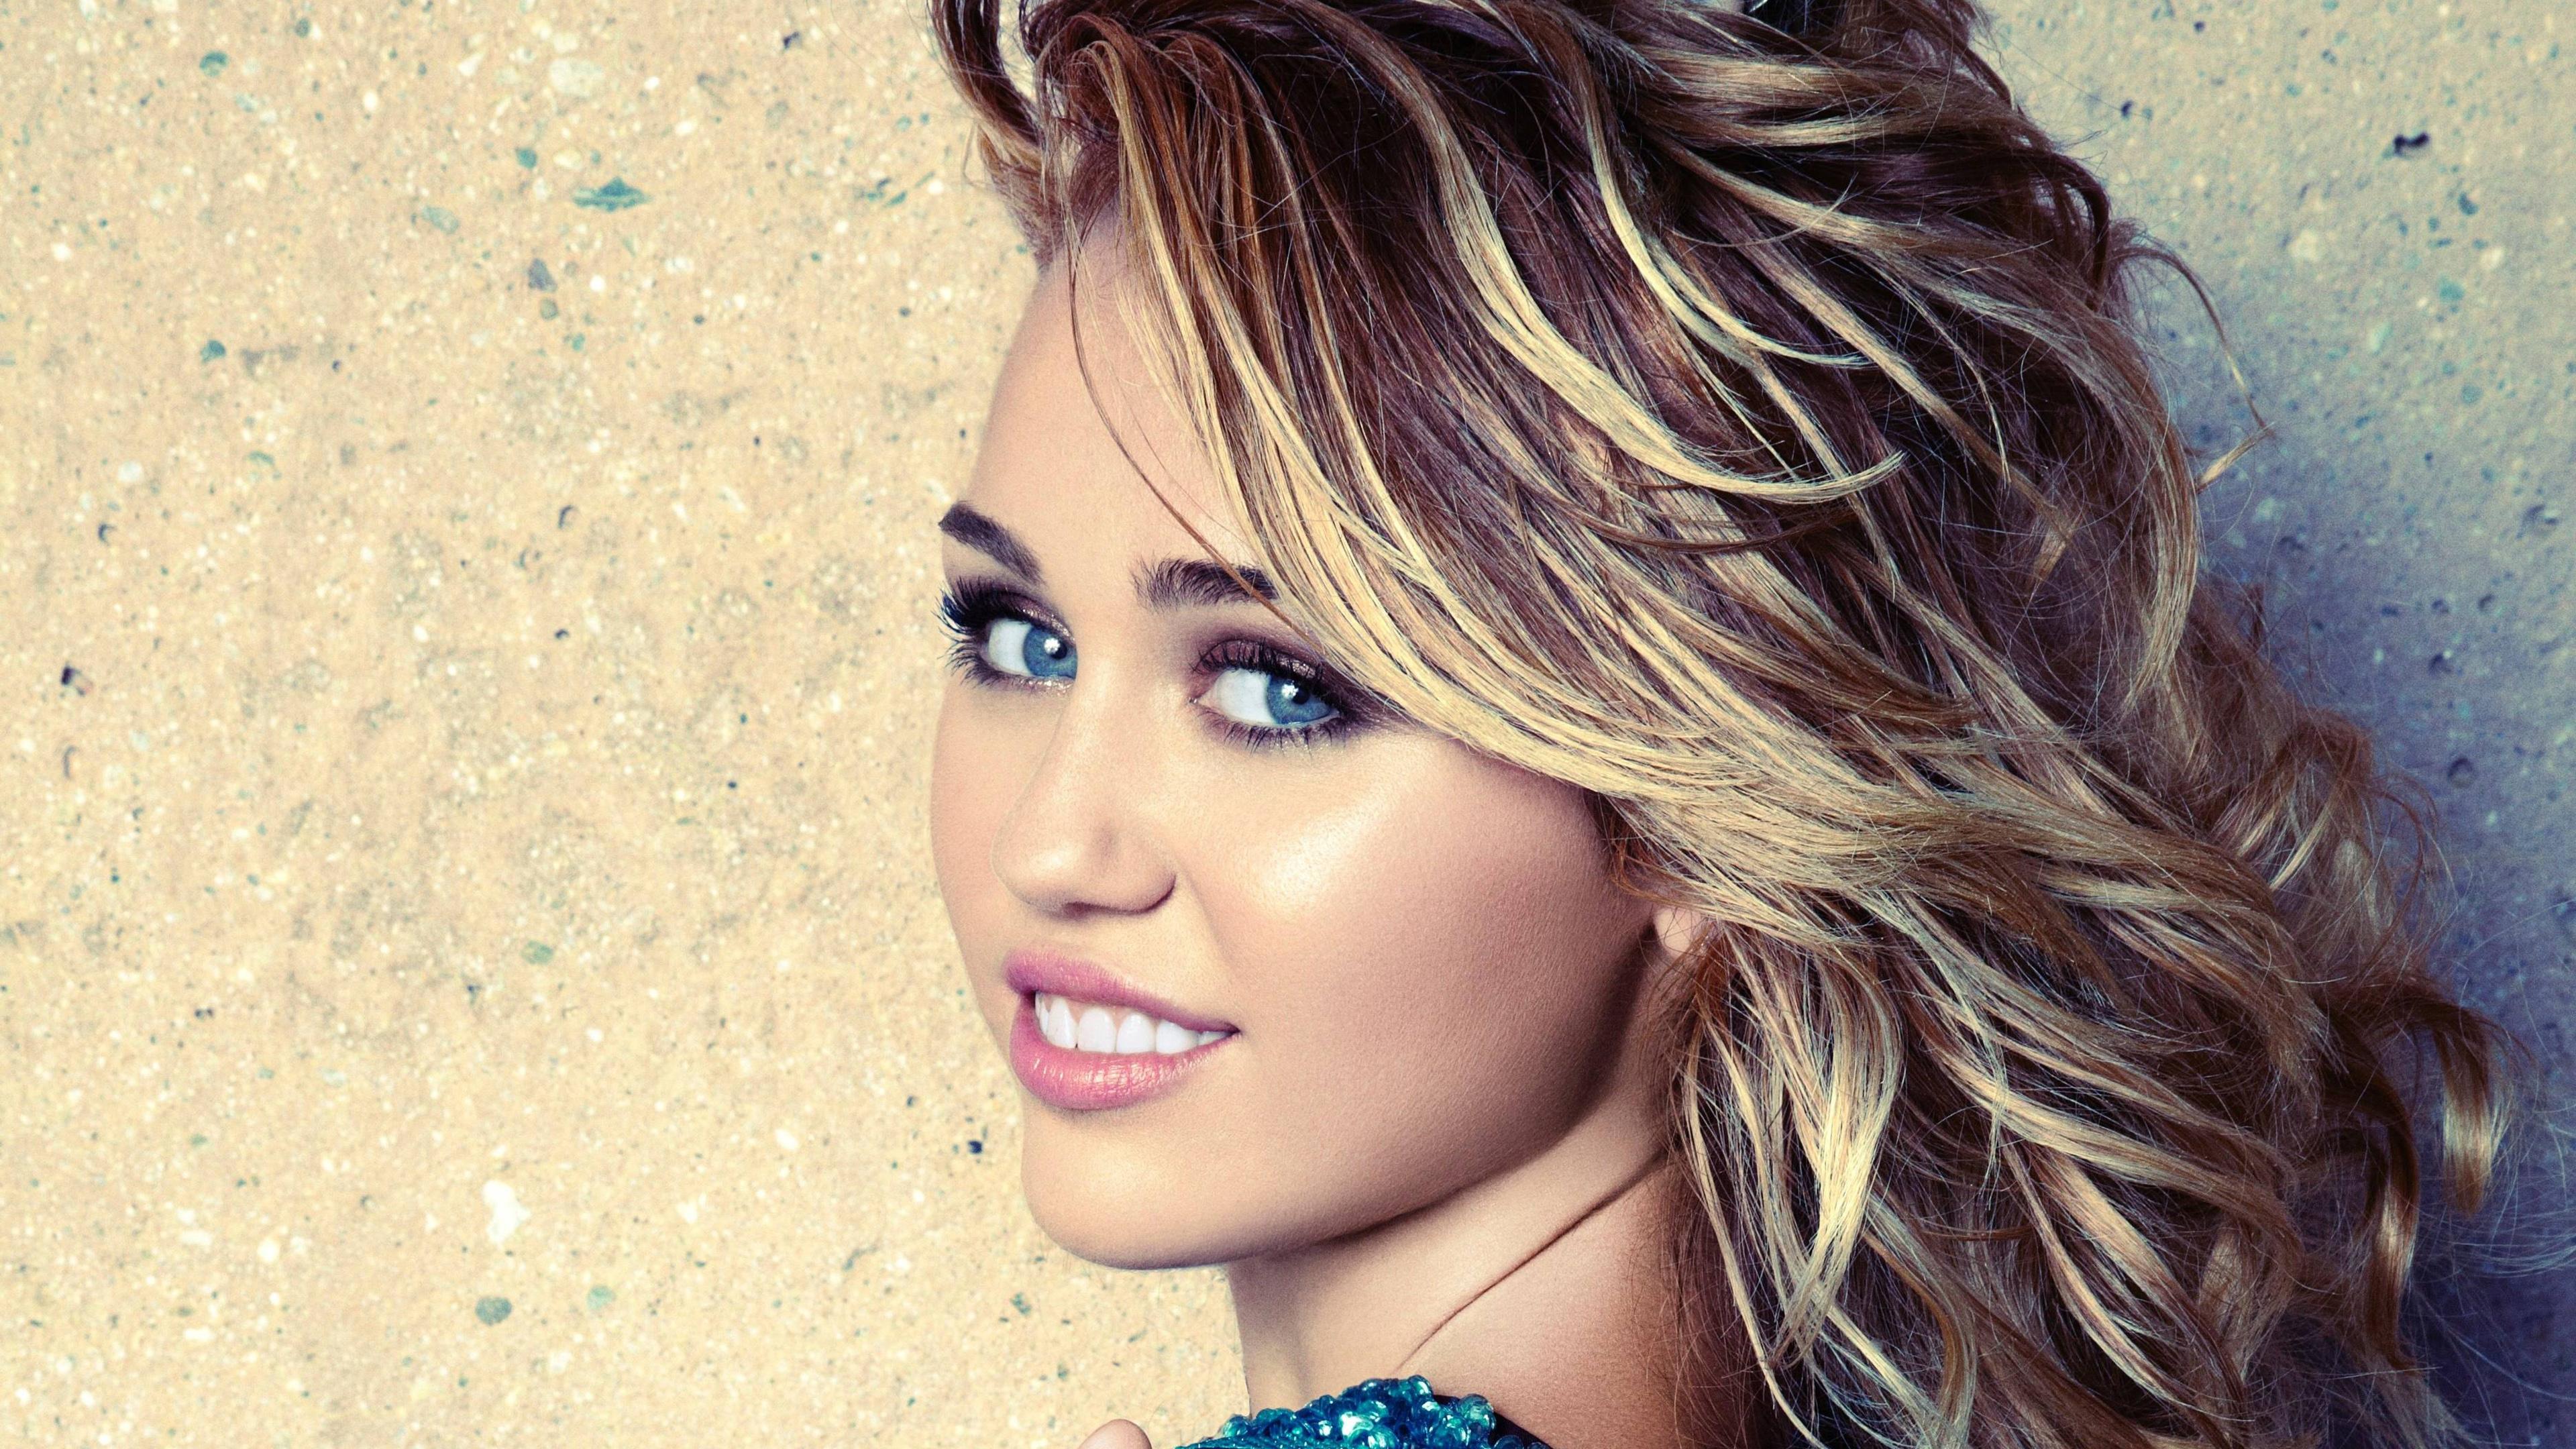 Miley Cyrus 4k Ultra Fondo De Pantalla Hd Fondo De